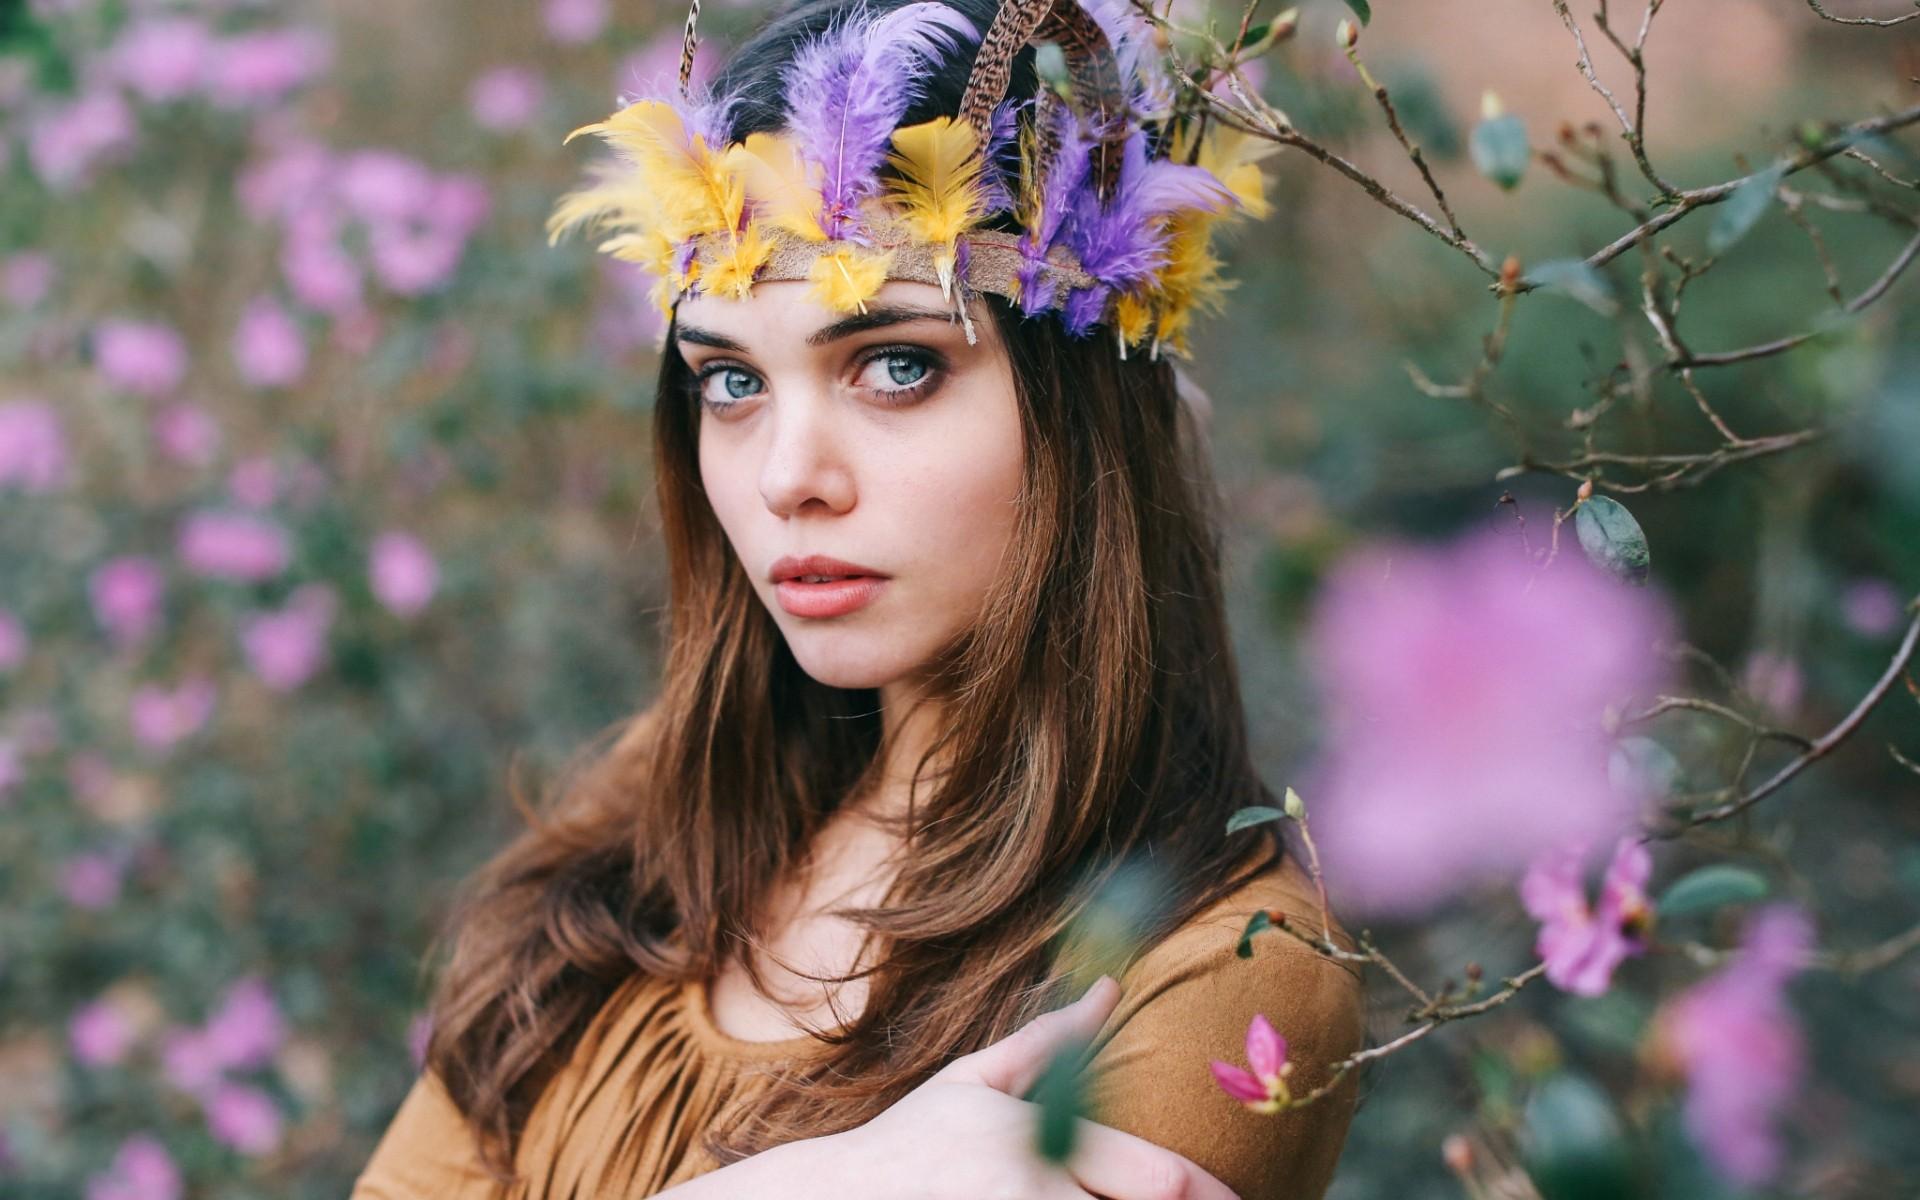 Wallpaper Face Women Outdoors Model Blue Eyes Brunette